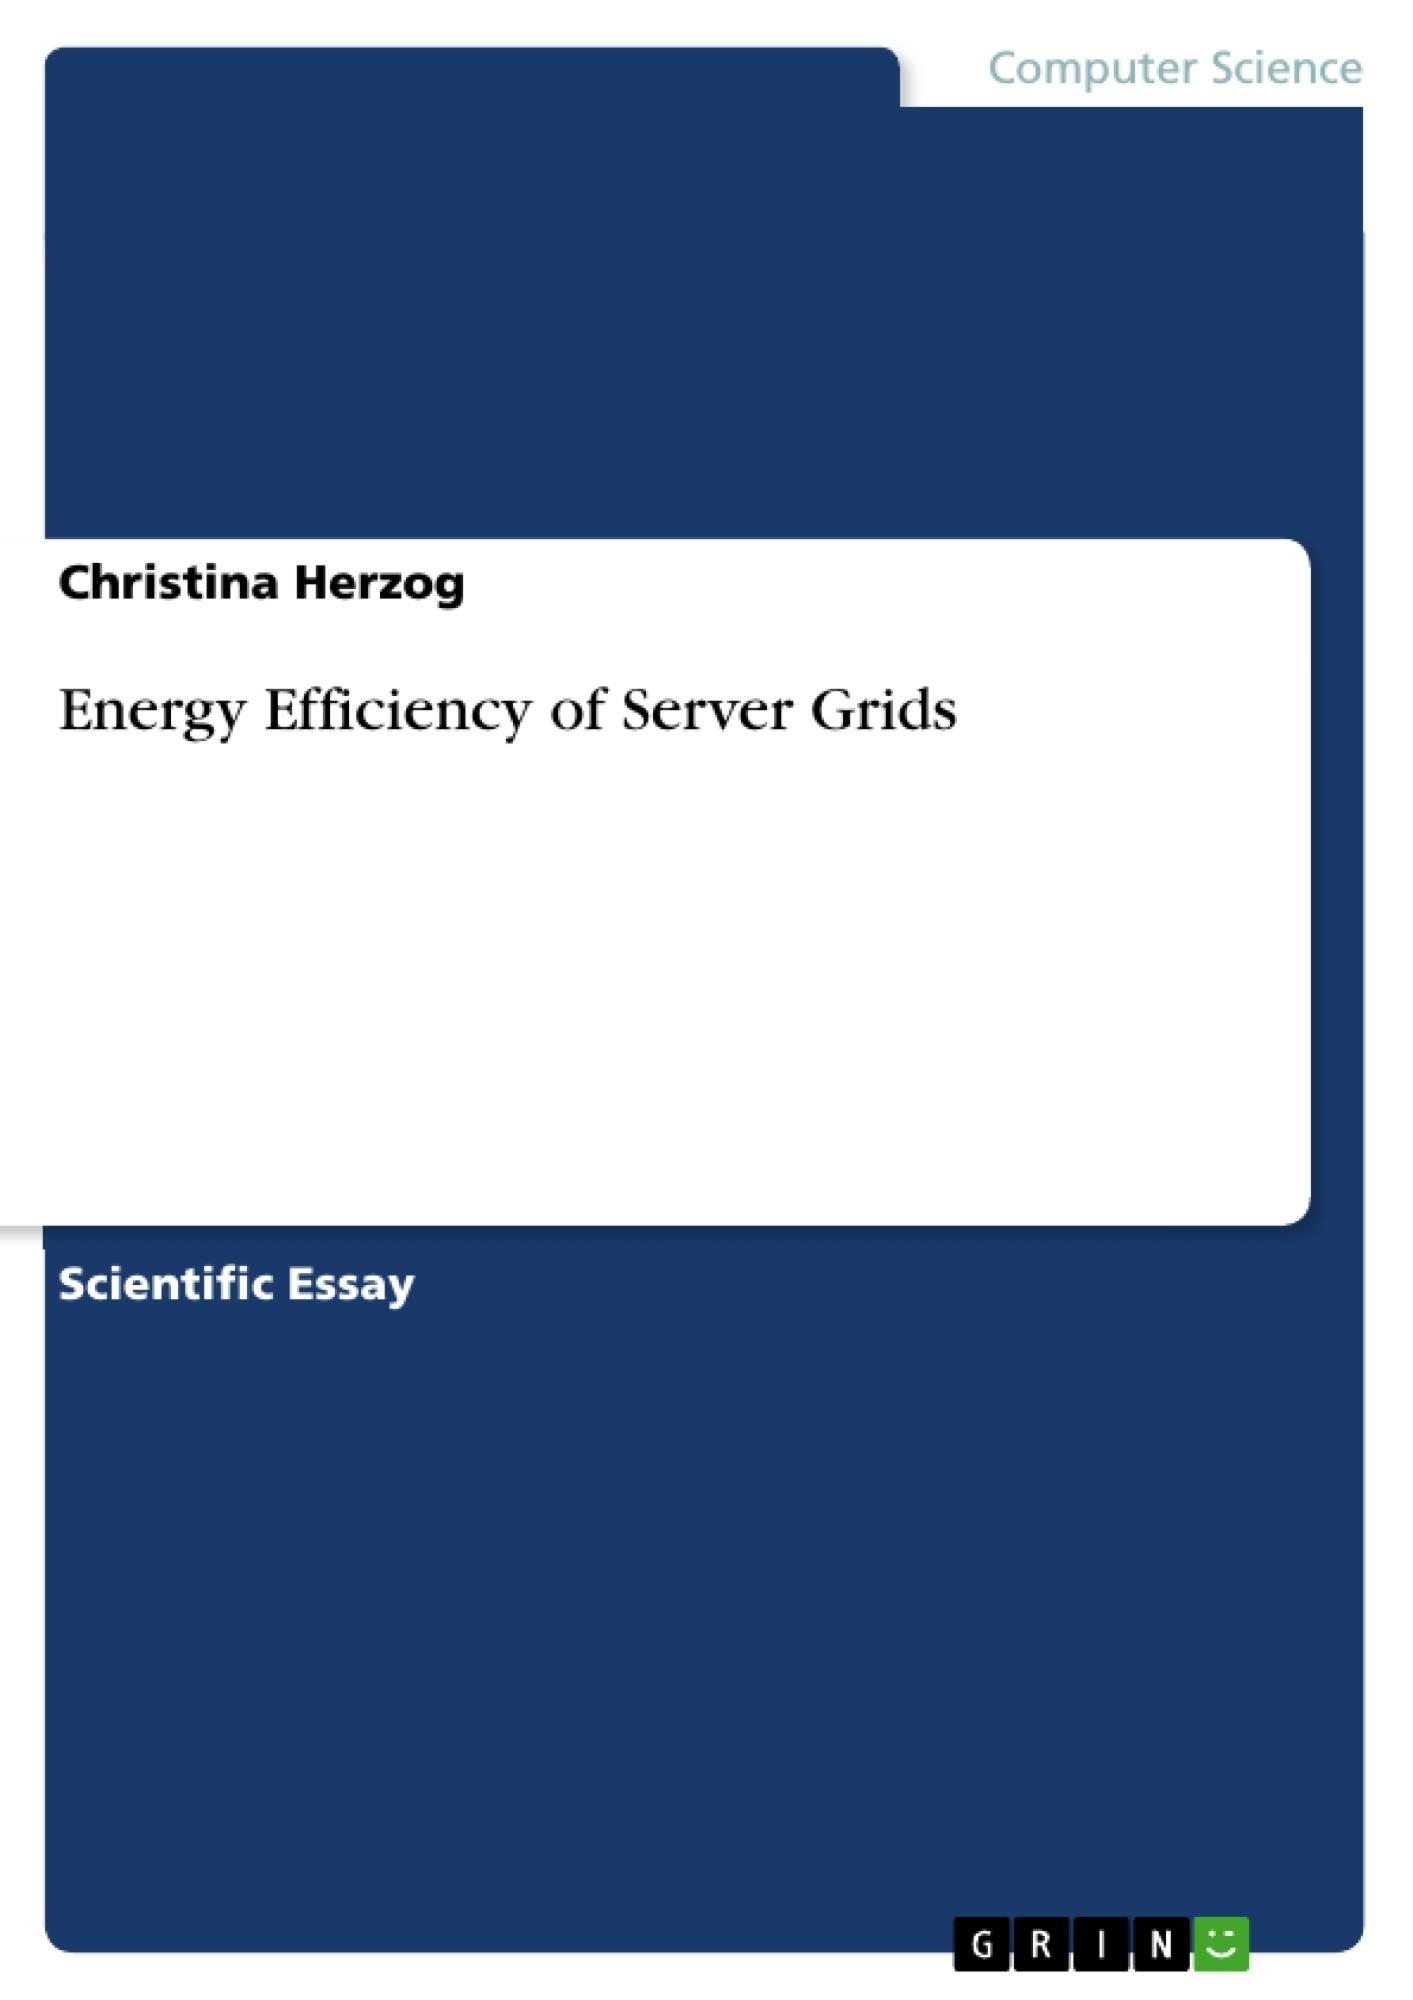 Title: Energy Efficiency of Server Grids